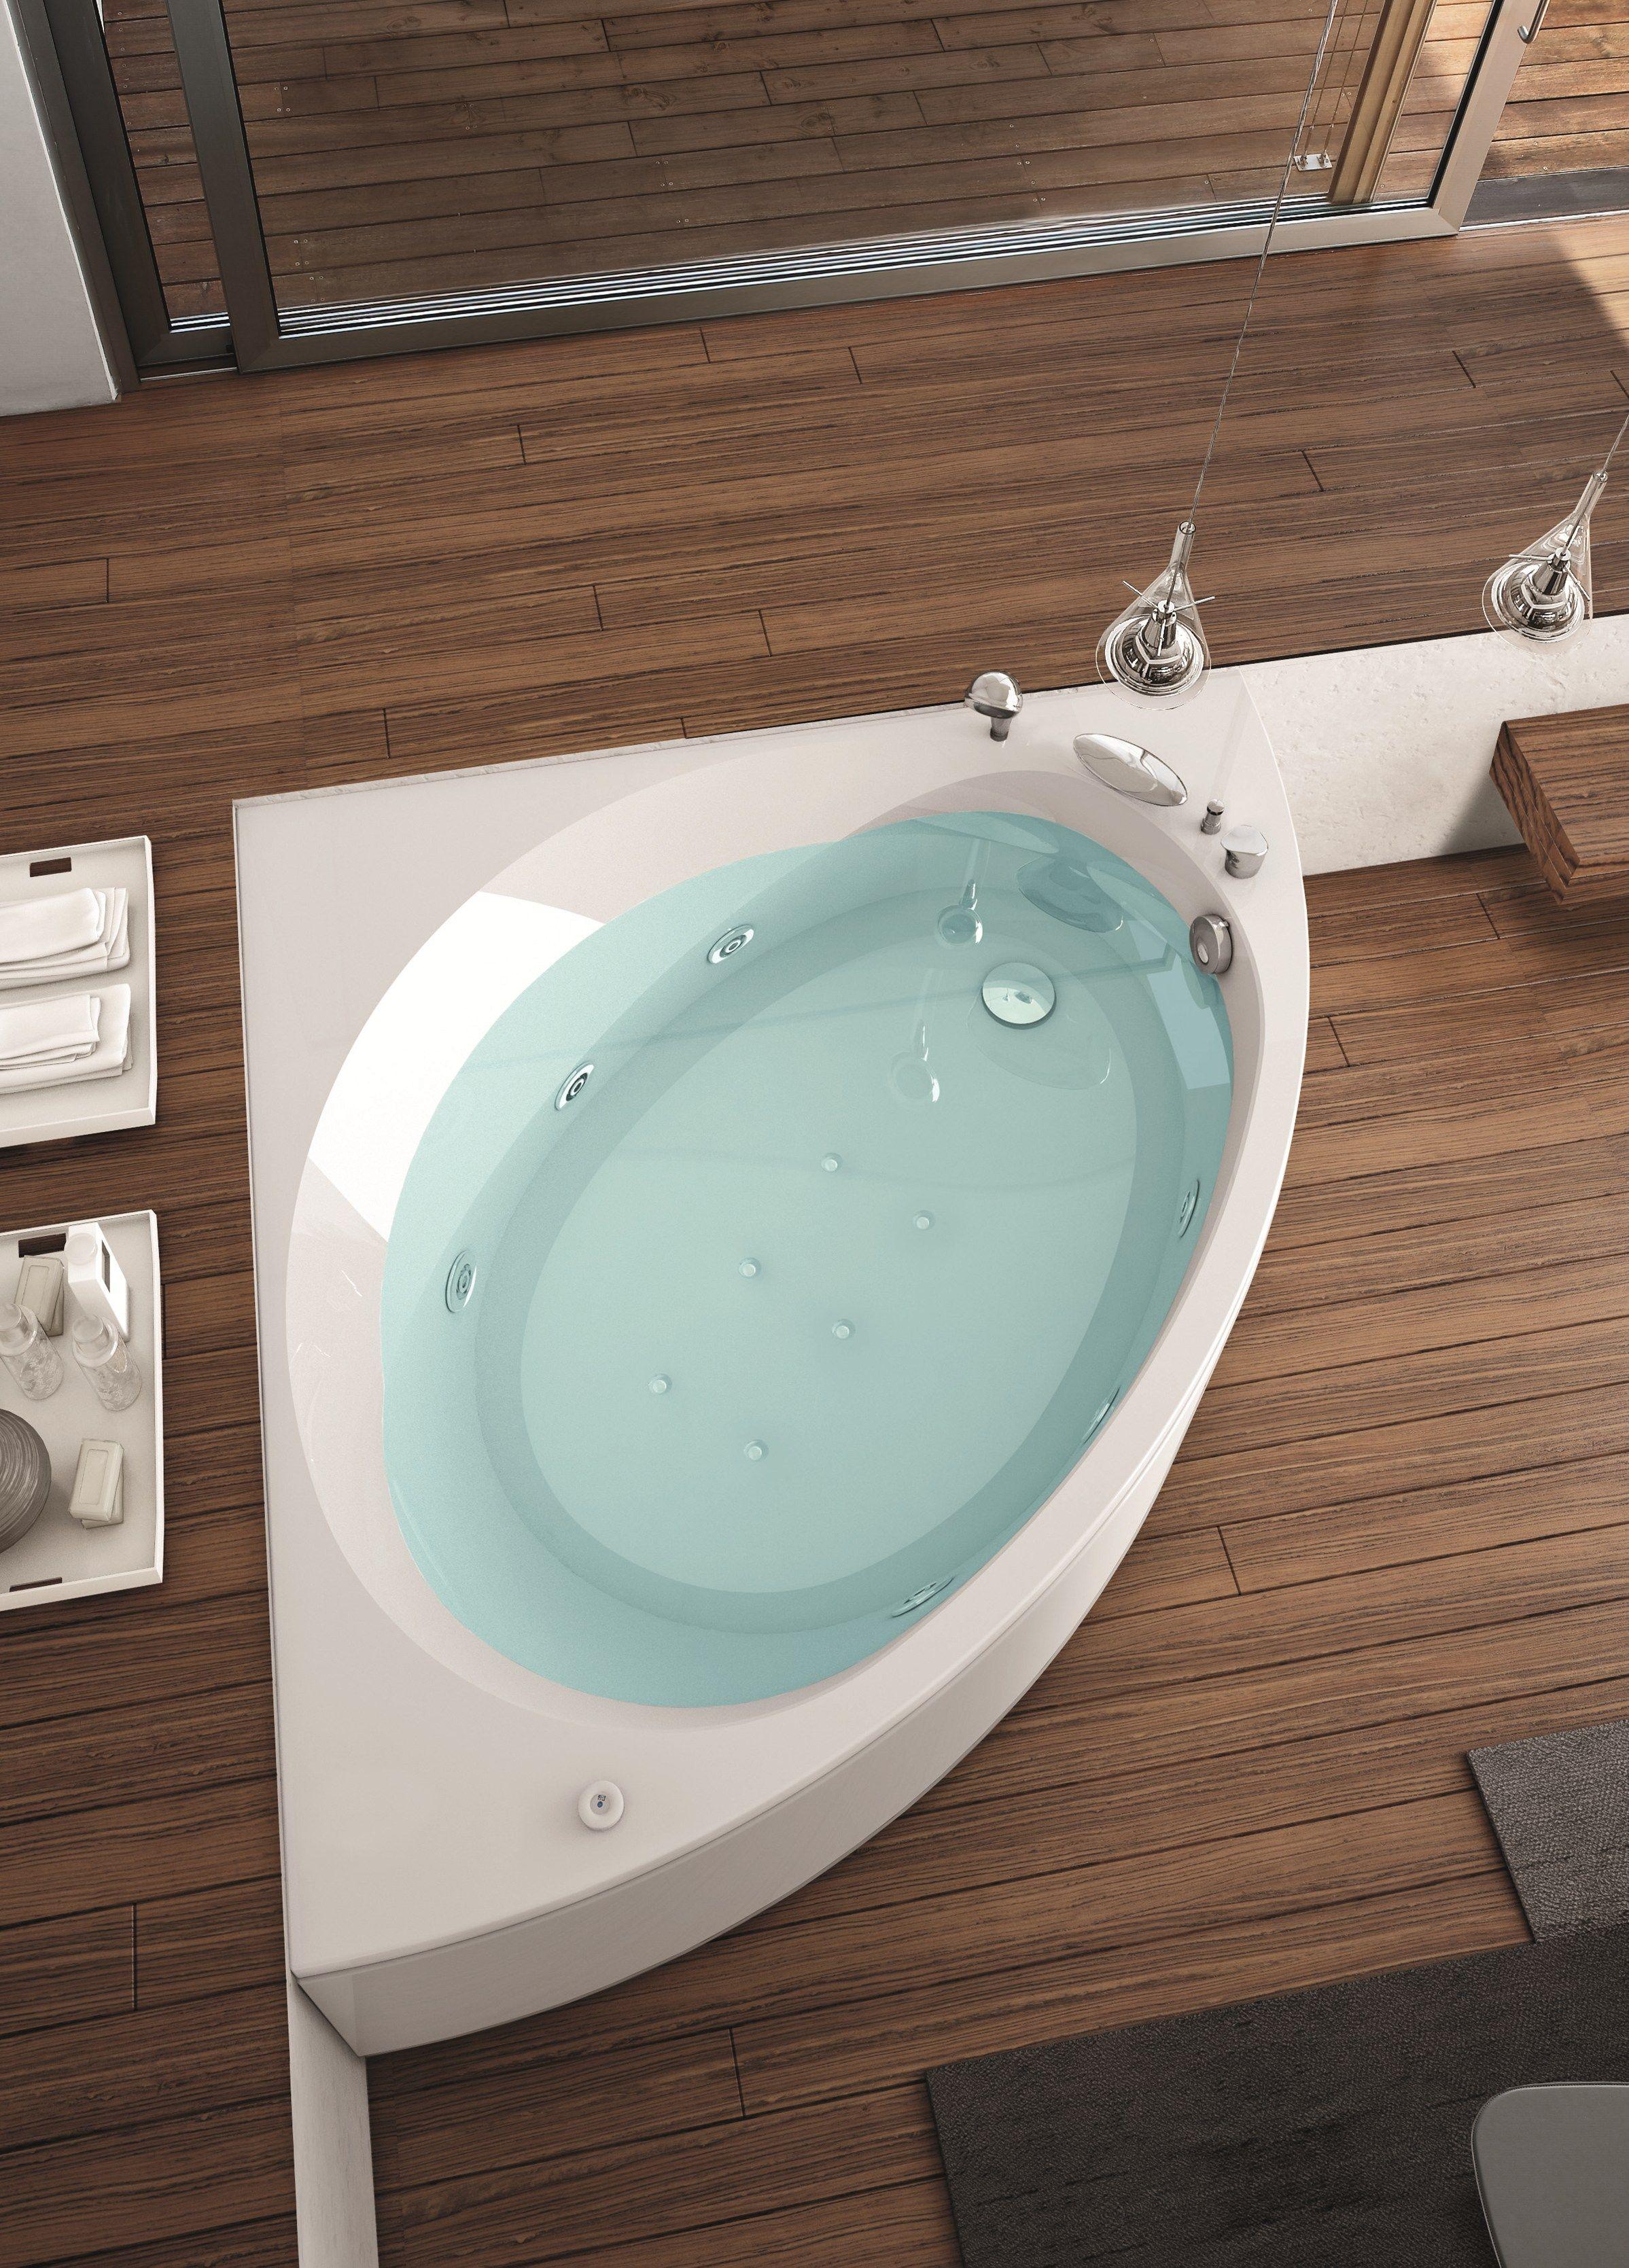 Bathroom With Jacuzzi Design Ideas Html on outdoor hot tub design ideas, bathroom with tub and shower combination ideas, jacuzzi hot tub spa, bathroom color ideas, granite bathroom designs ideas, jacuzzi spa design, jacuzzi and shower bathroom design, jacuzzi tub design ideas,